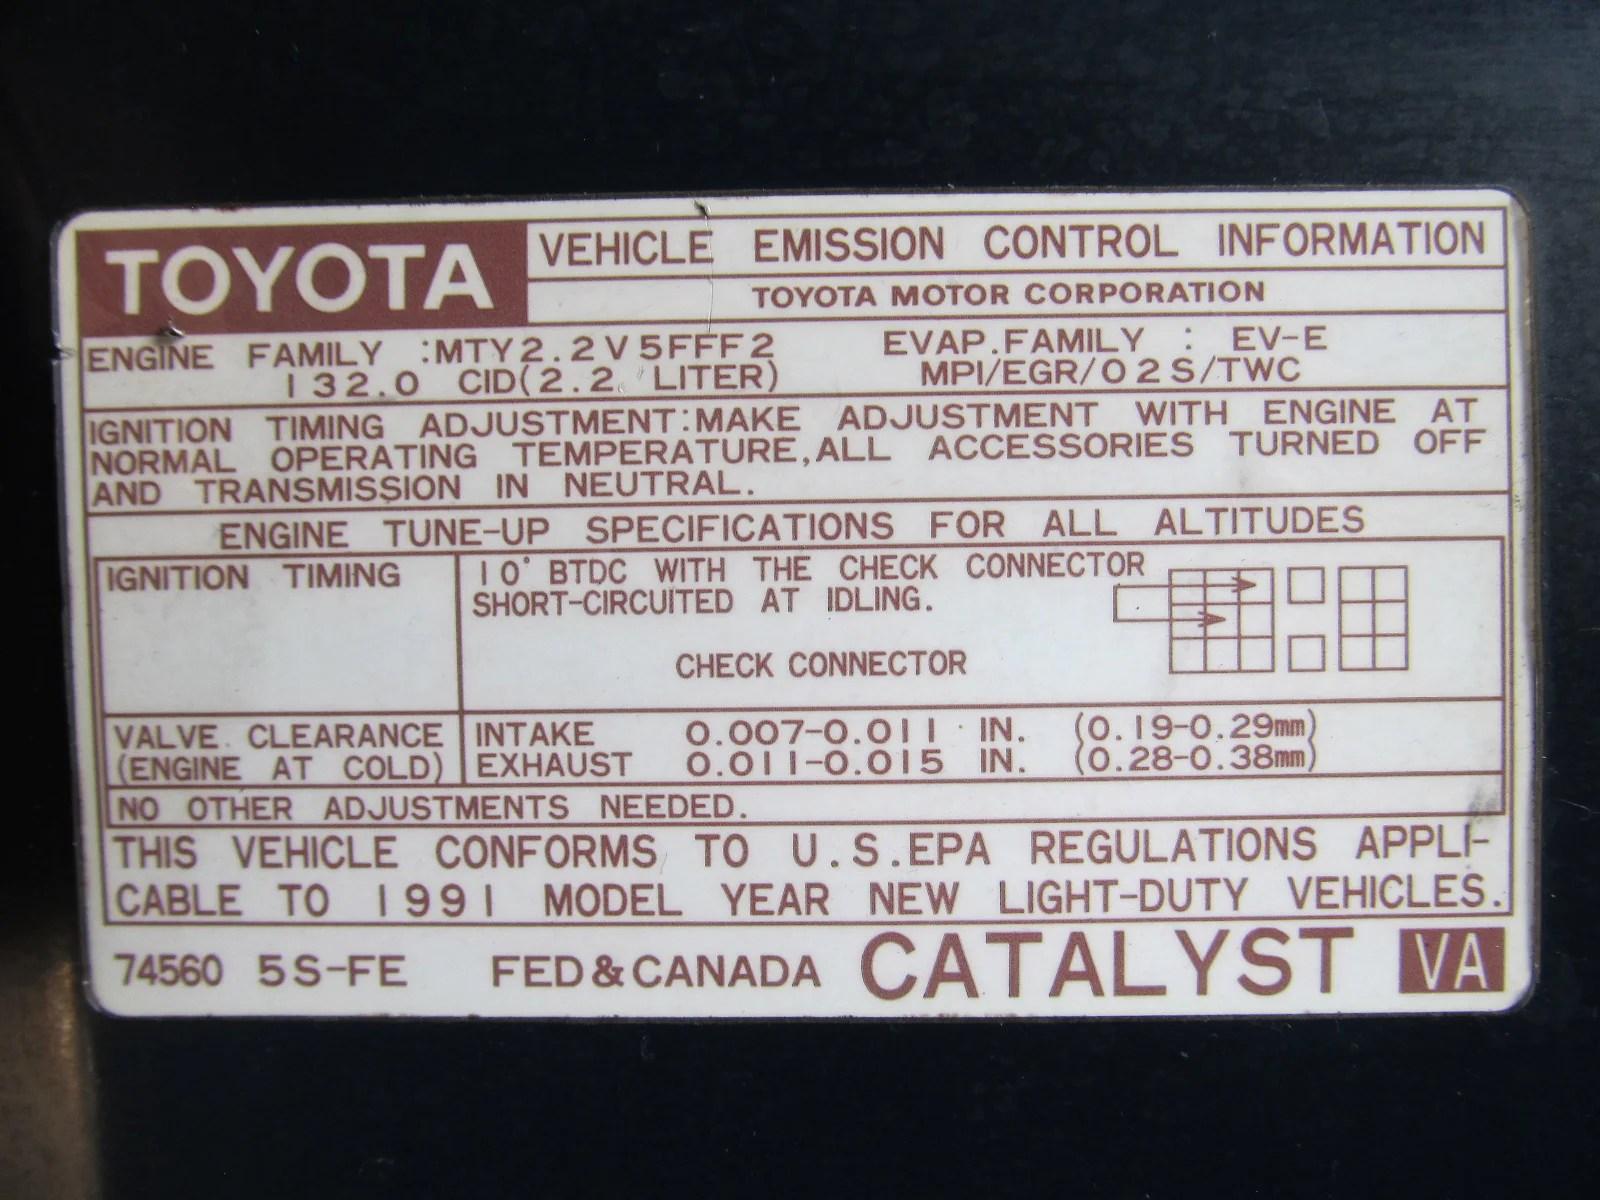 91 mr2 2 2l 5sfe at vehicle emission control information diagram [ 1600 x 1200 Pixel ]